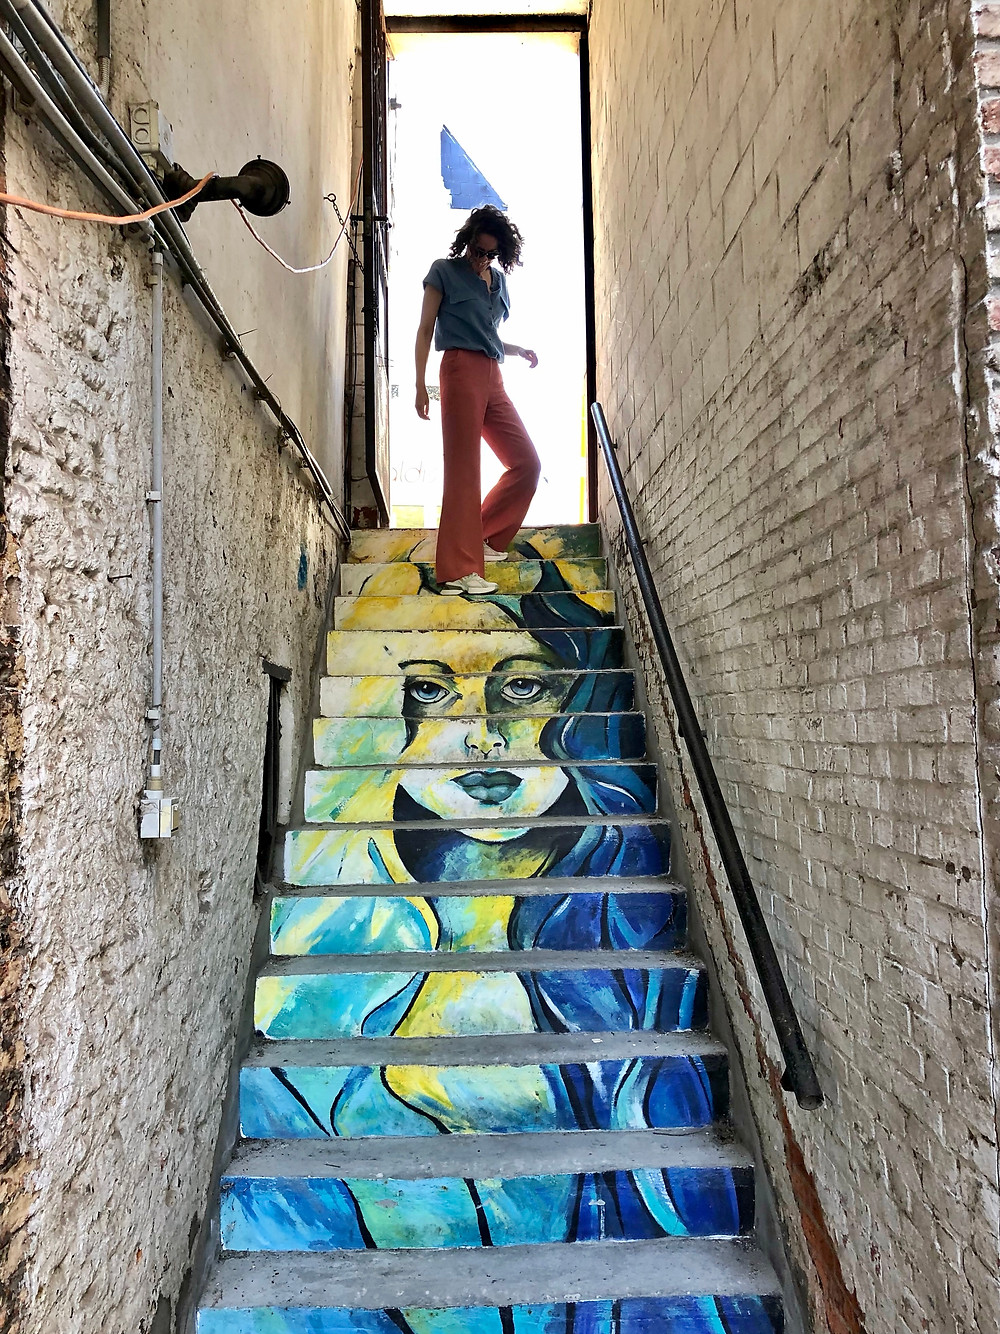 Lonnies Planet at street art by Sarah Vanden Branden Mechelen